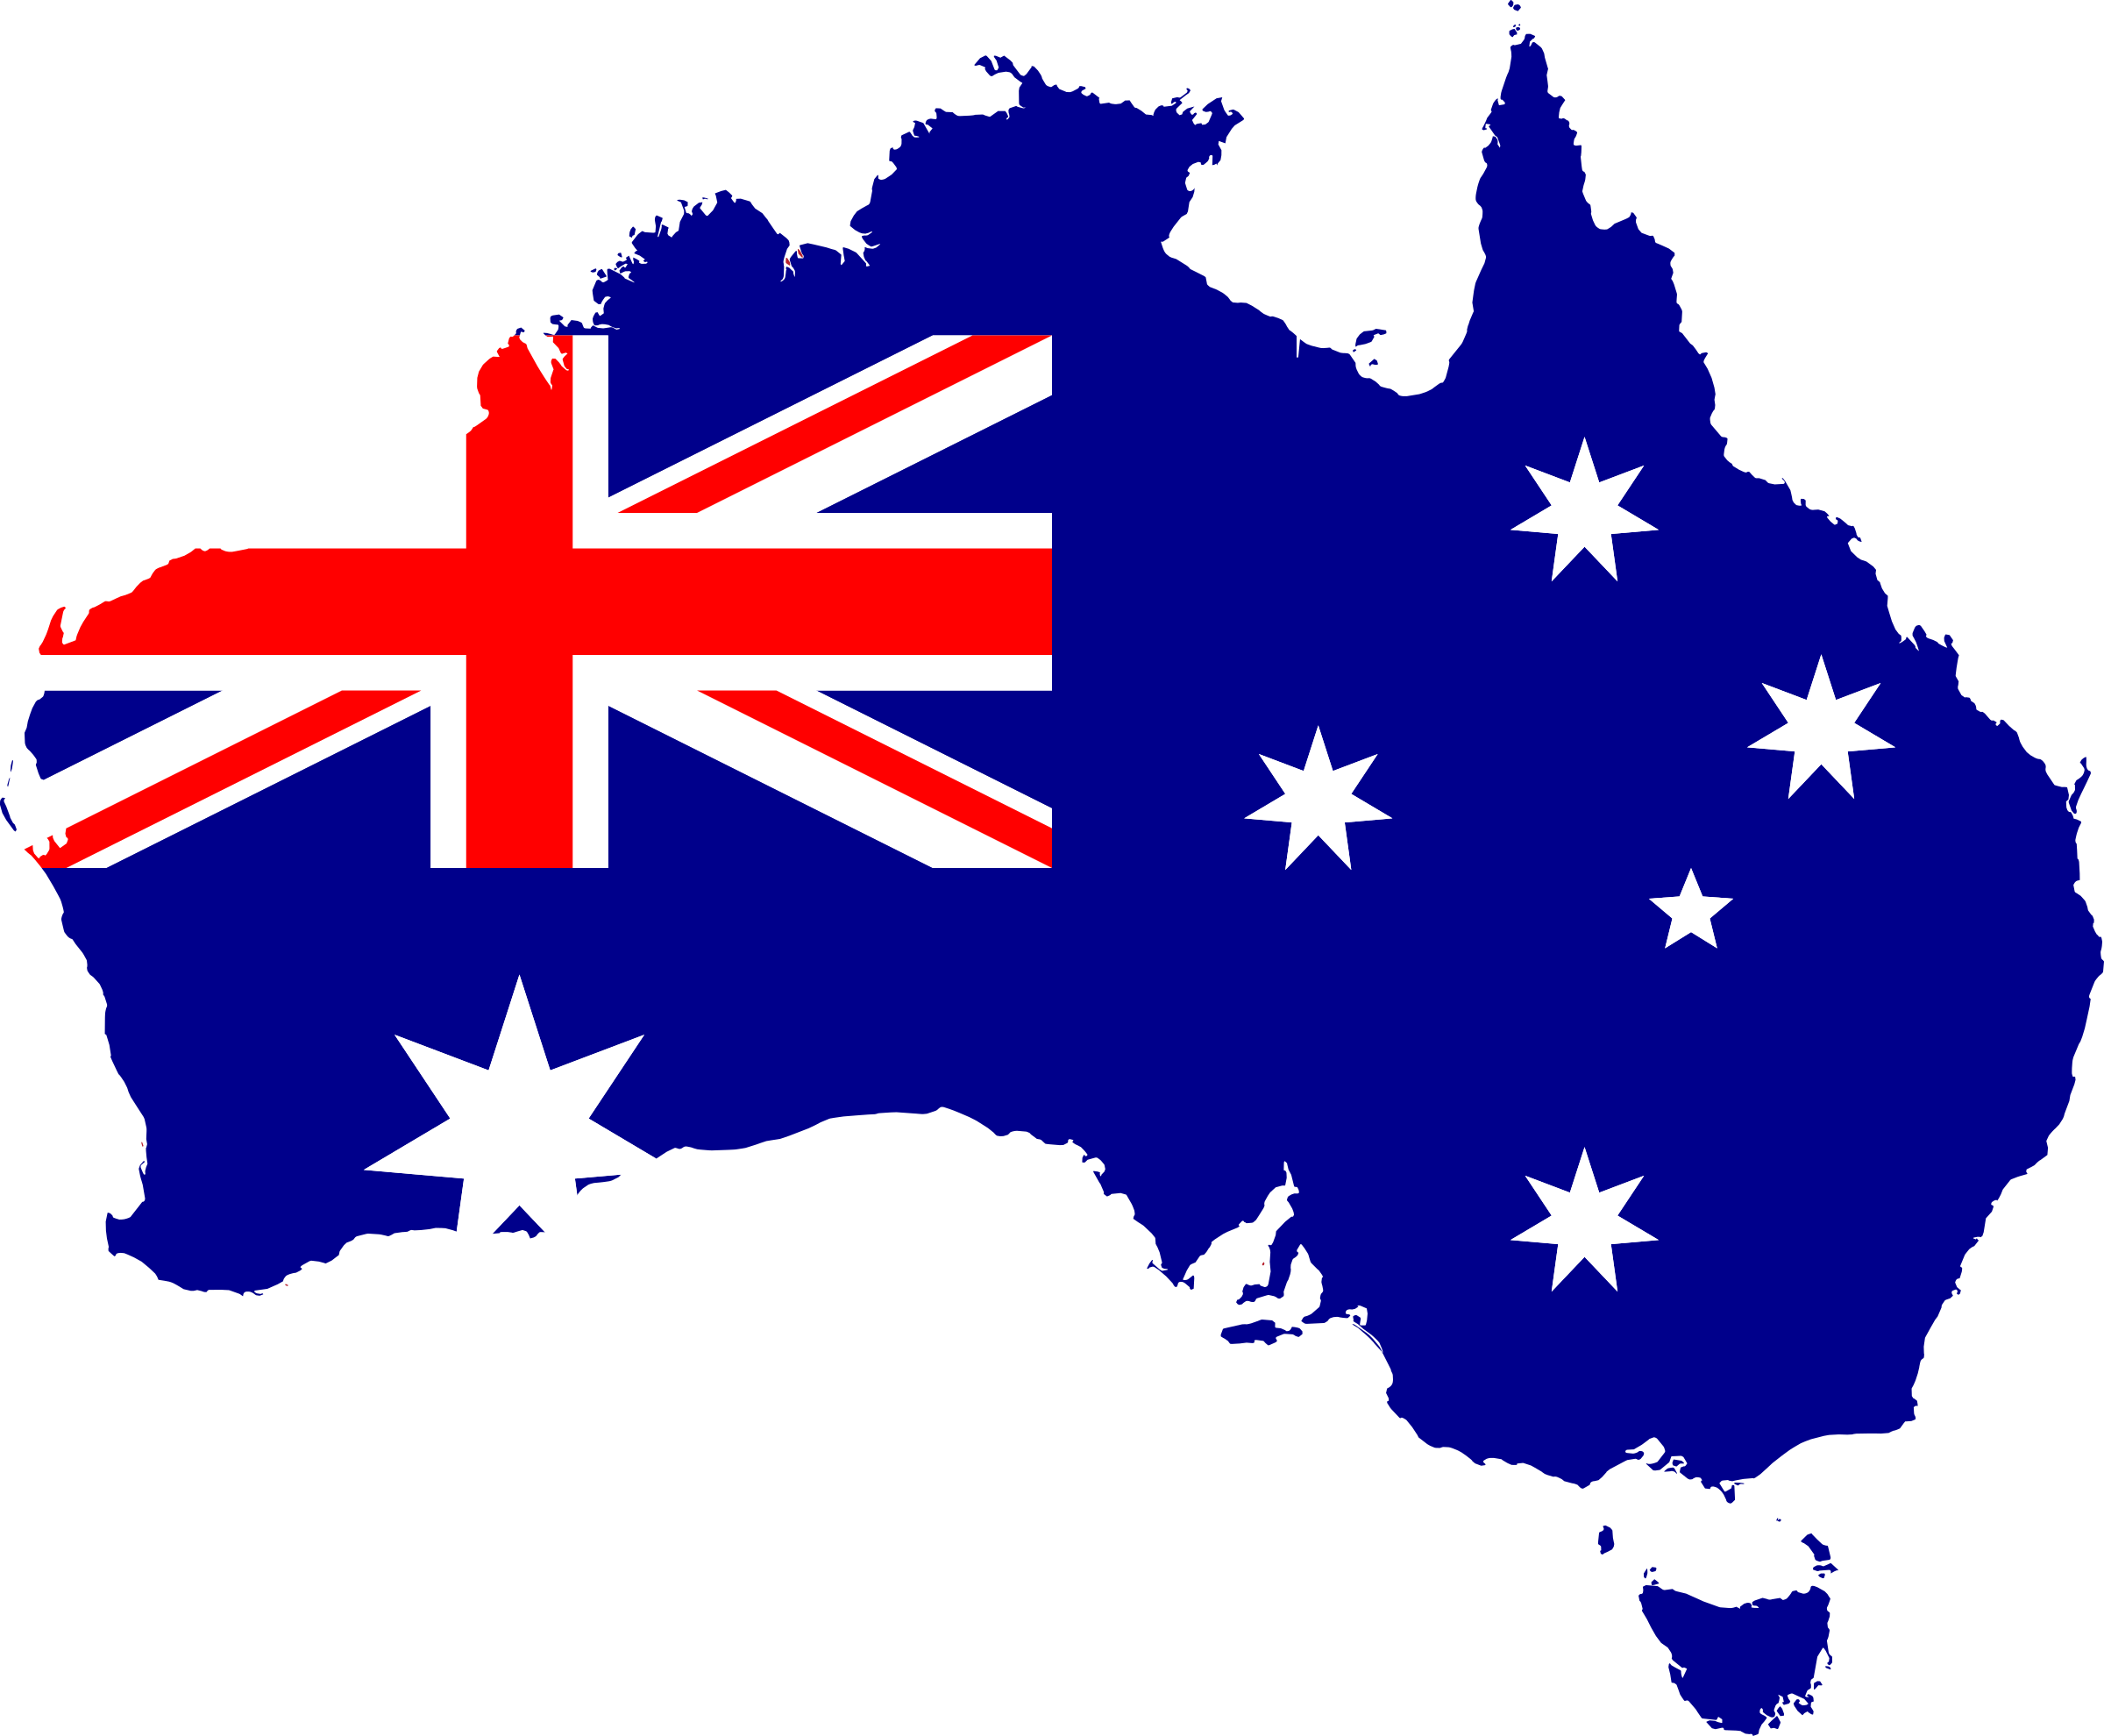 Australian flag debate